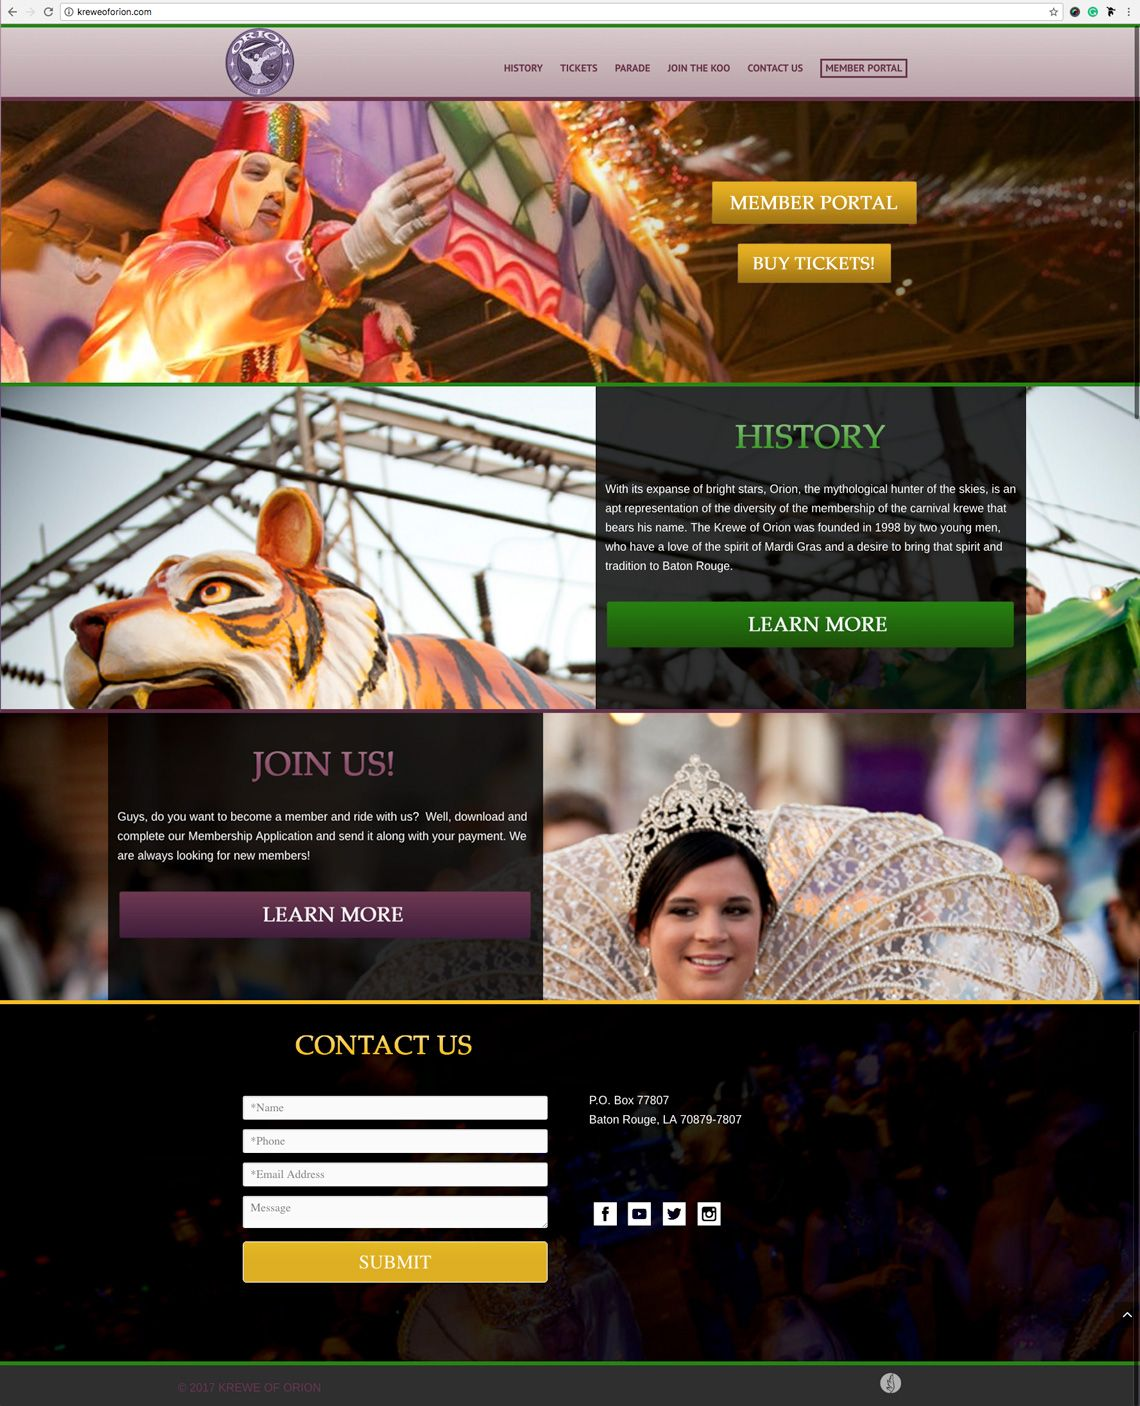 Pin by dezinsINTERACTIVE on Our Design Portfolio Web